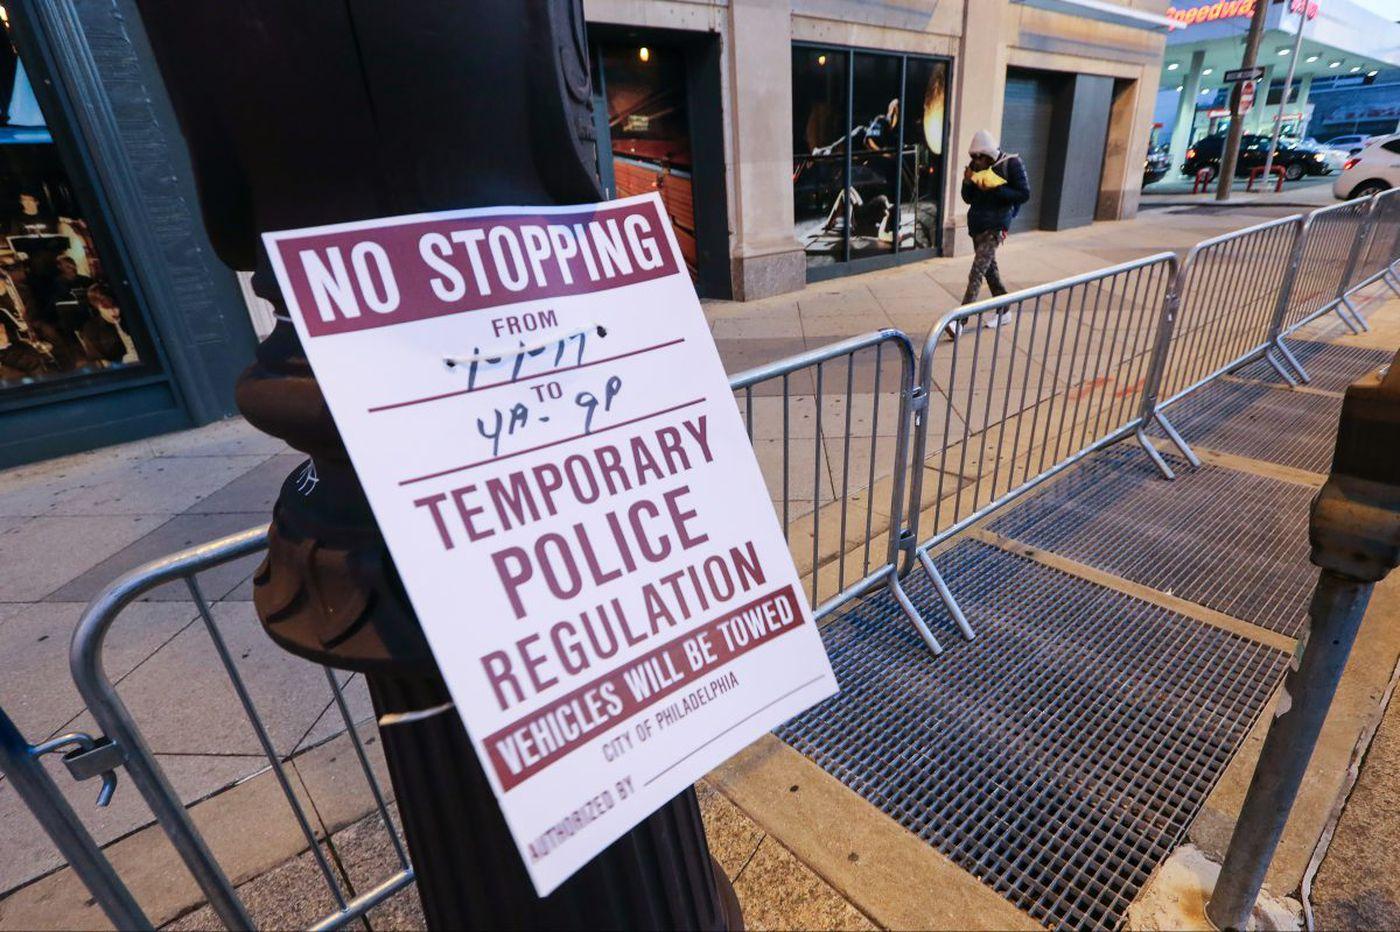 Eagles parade: Road closures, parking for Super Bowl celebration in Philadelphia, other impacts